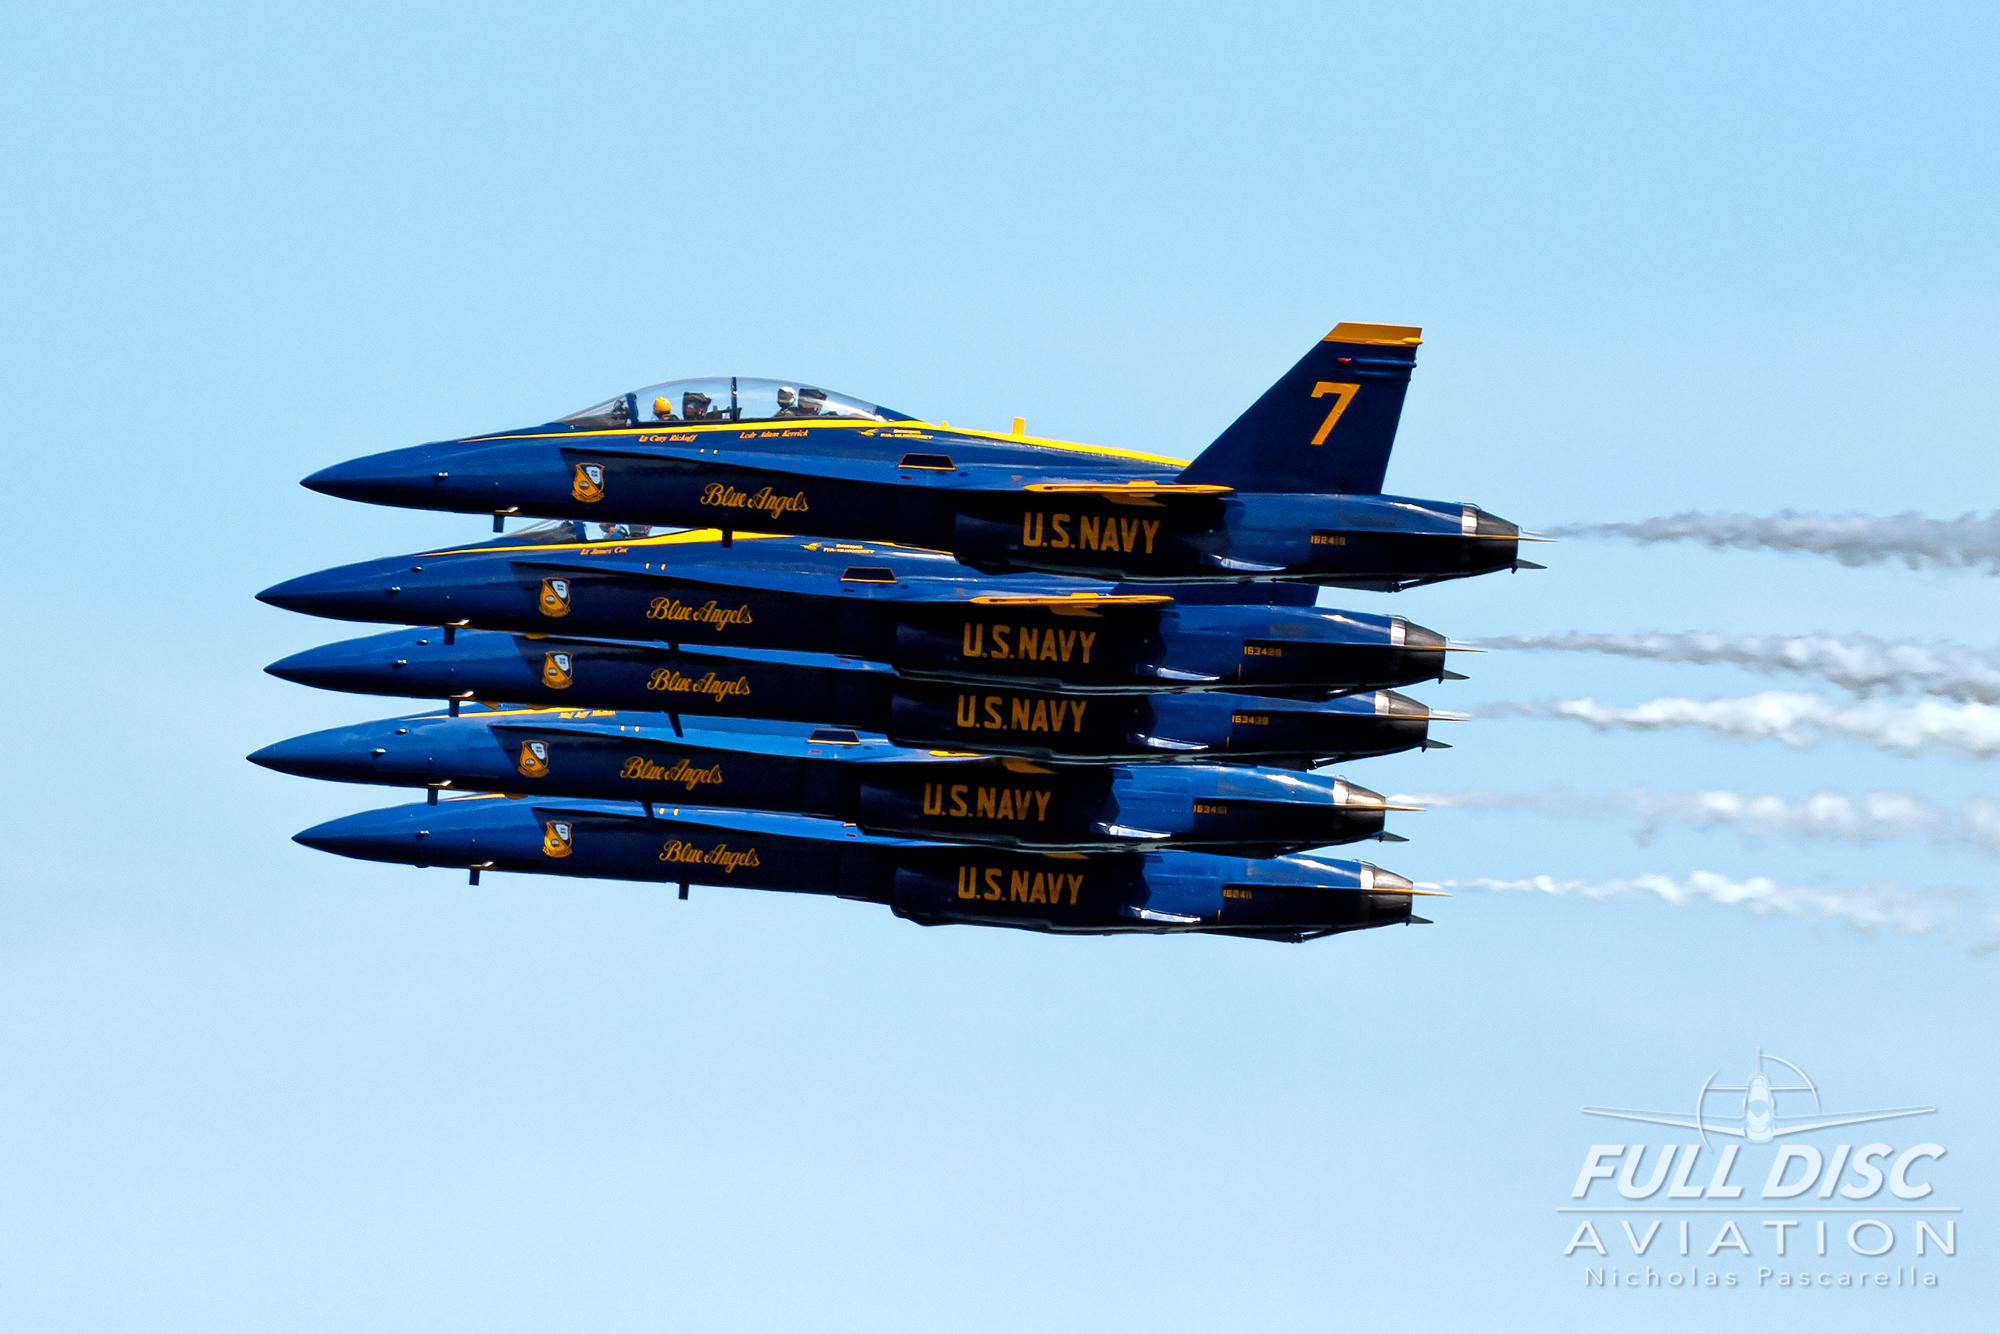 nickpascarella_fulldiscaviation_oceancityairshow_aviation_blueangels_linedup.jpg